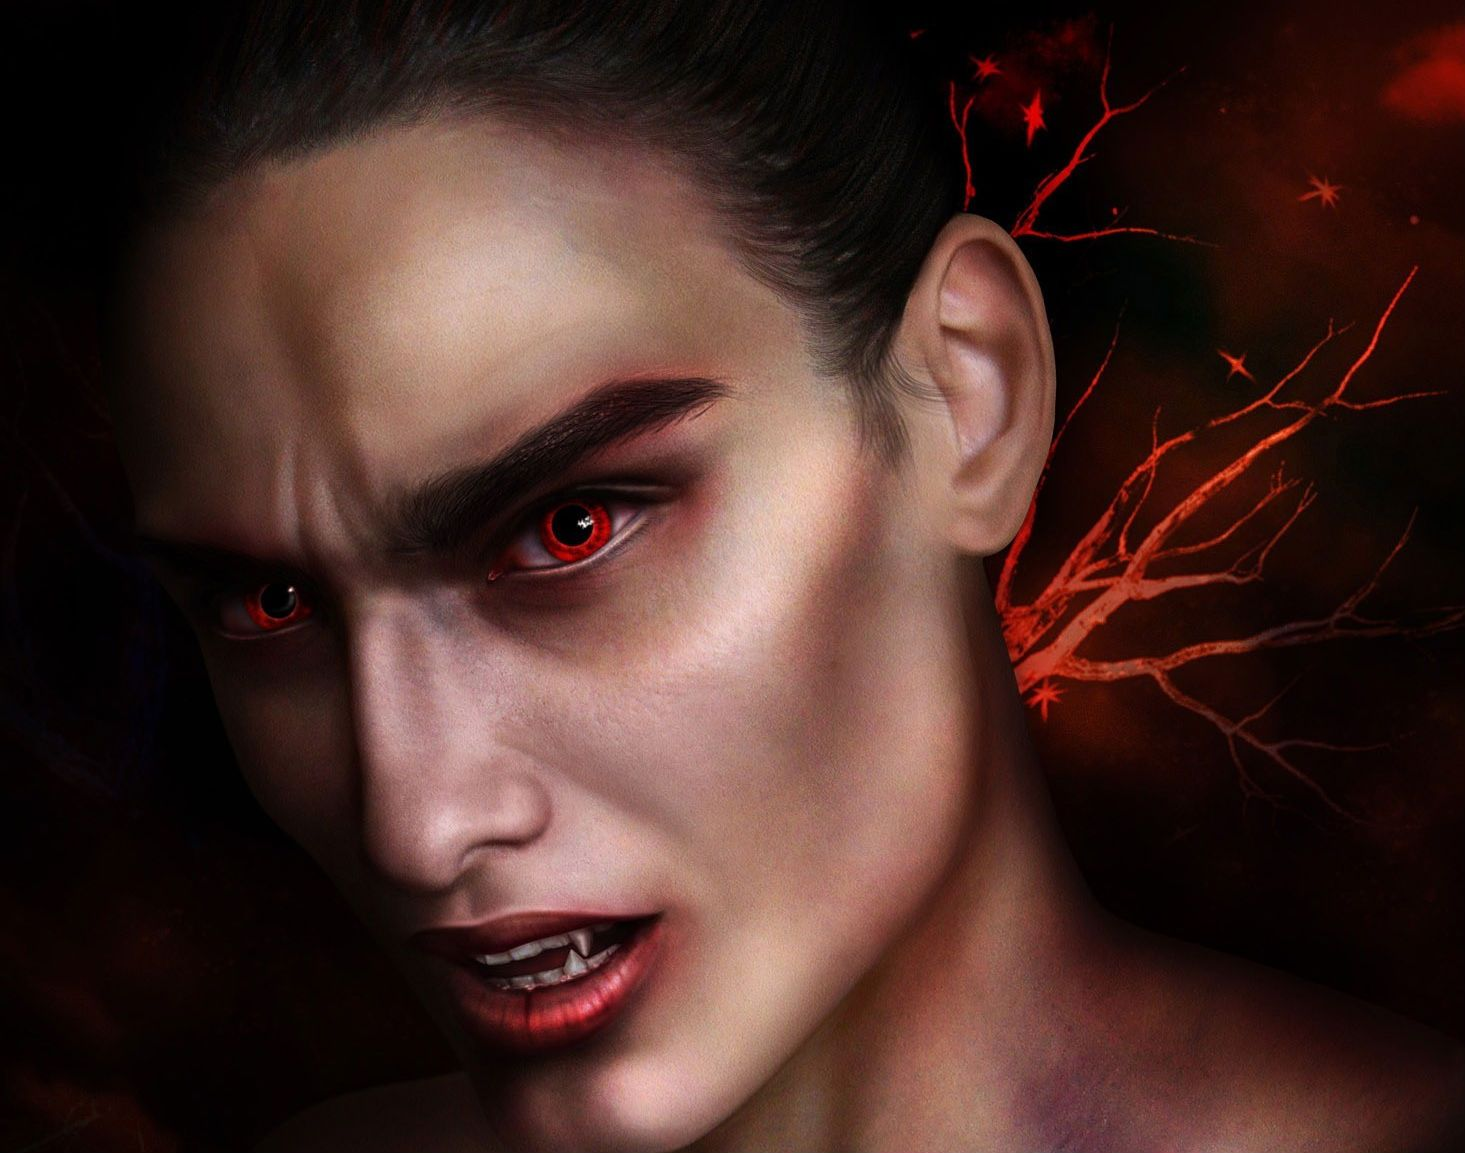 Вампиры картинки мужчины, открытками